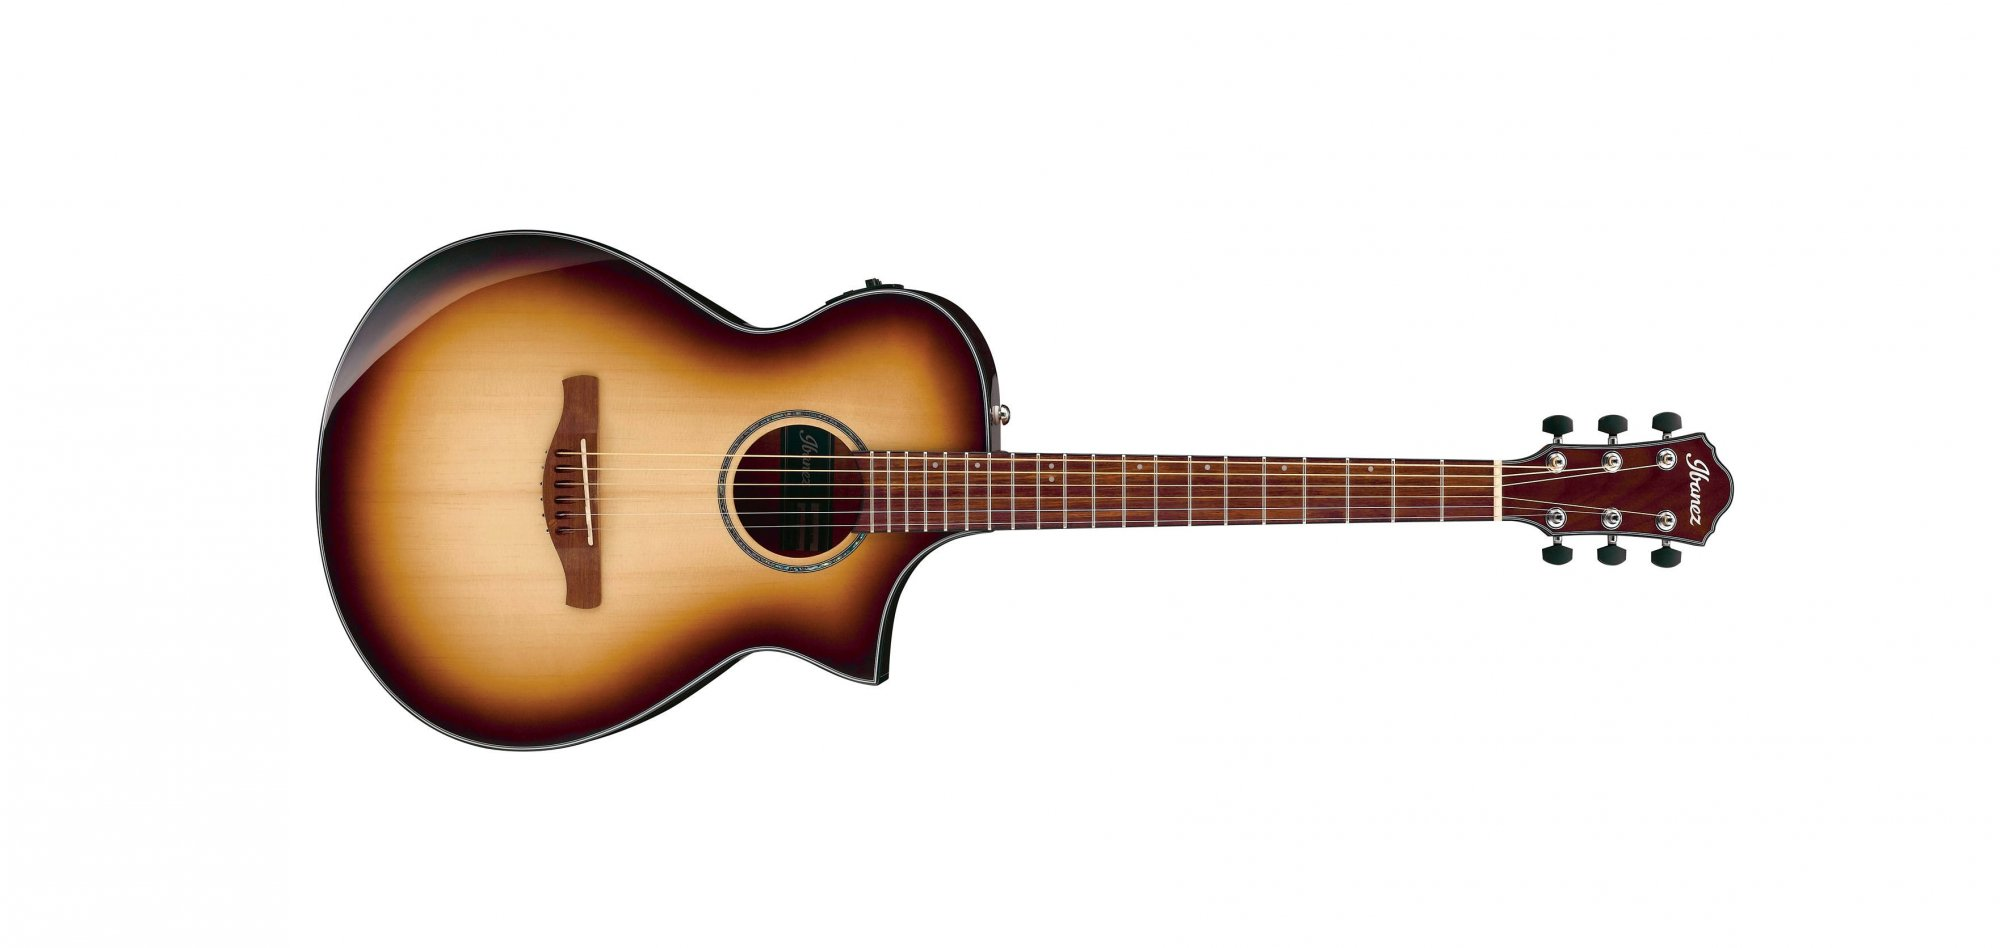 Ibanez AEWC300 Acoustic Electric Guitar, Natural Brown Burst